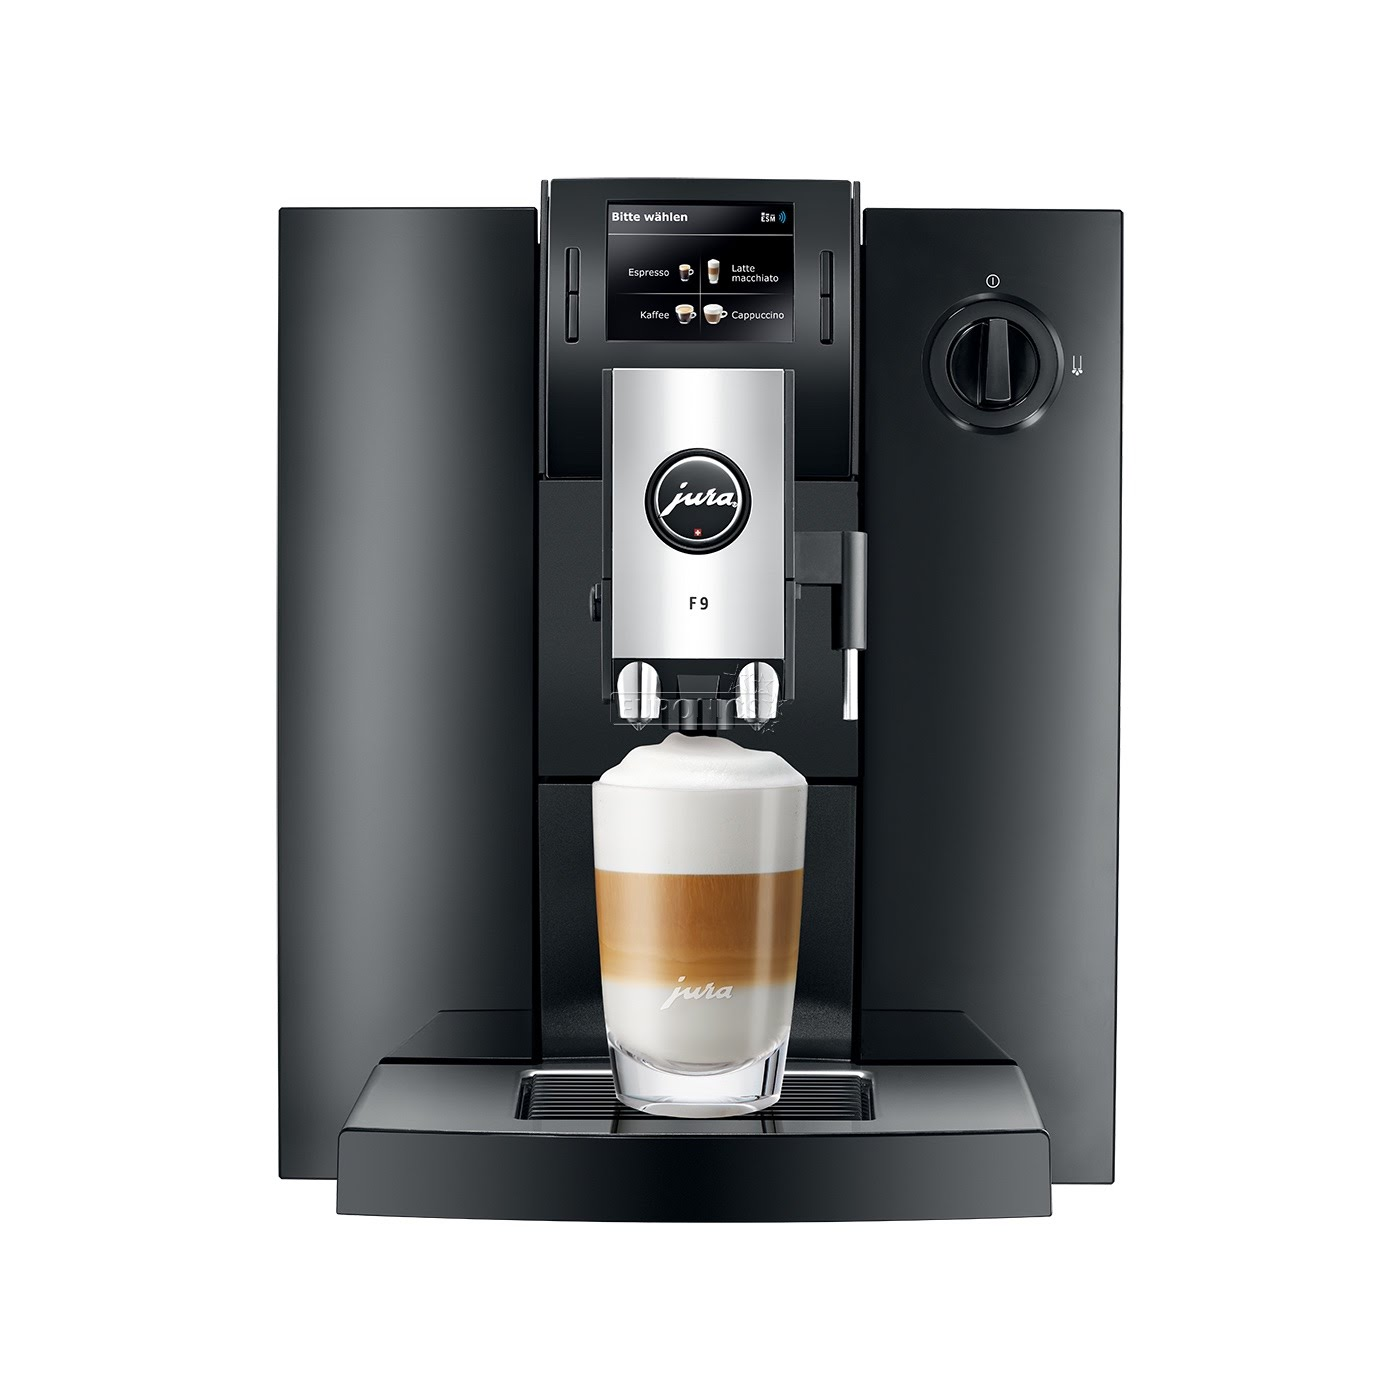 jura coffee machine price